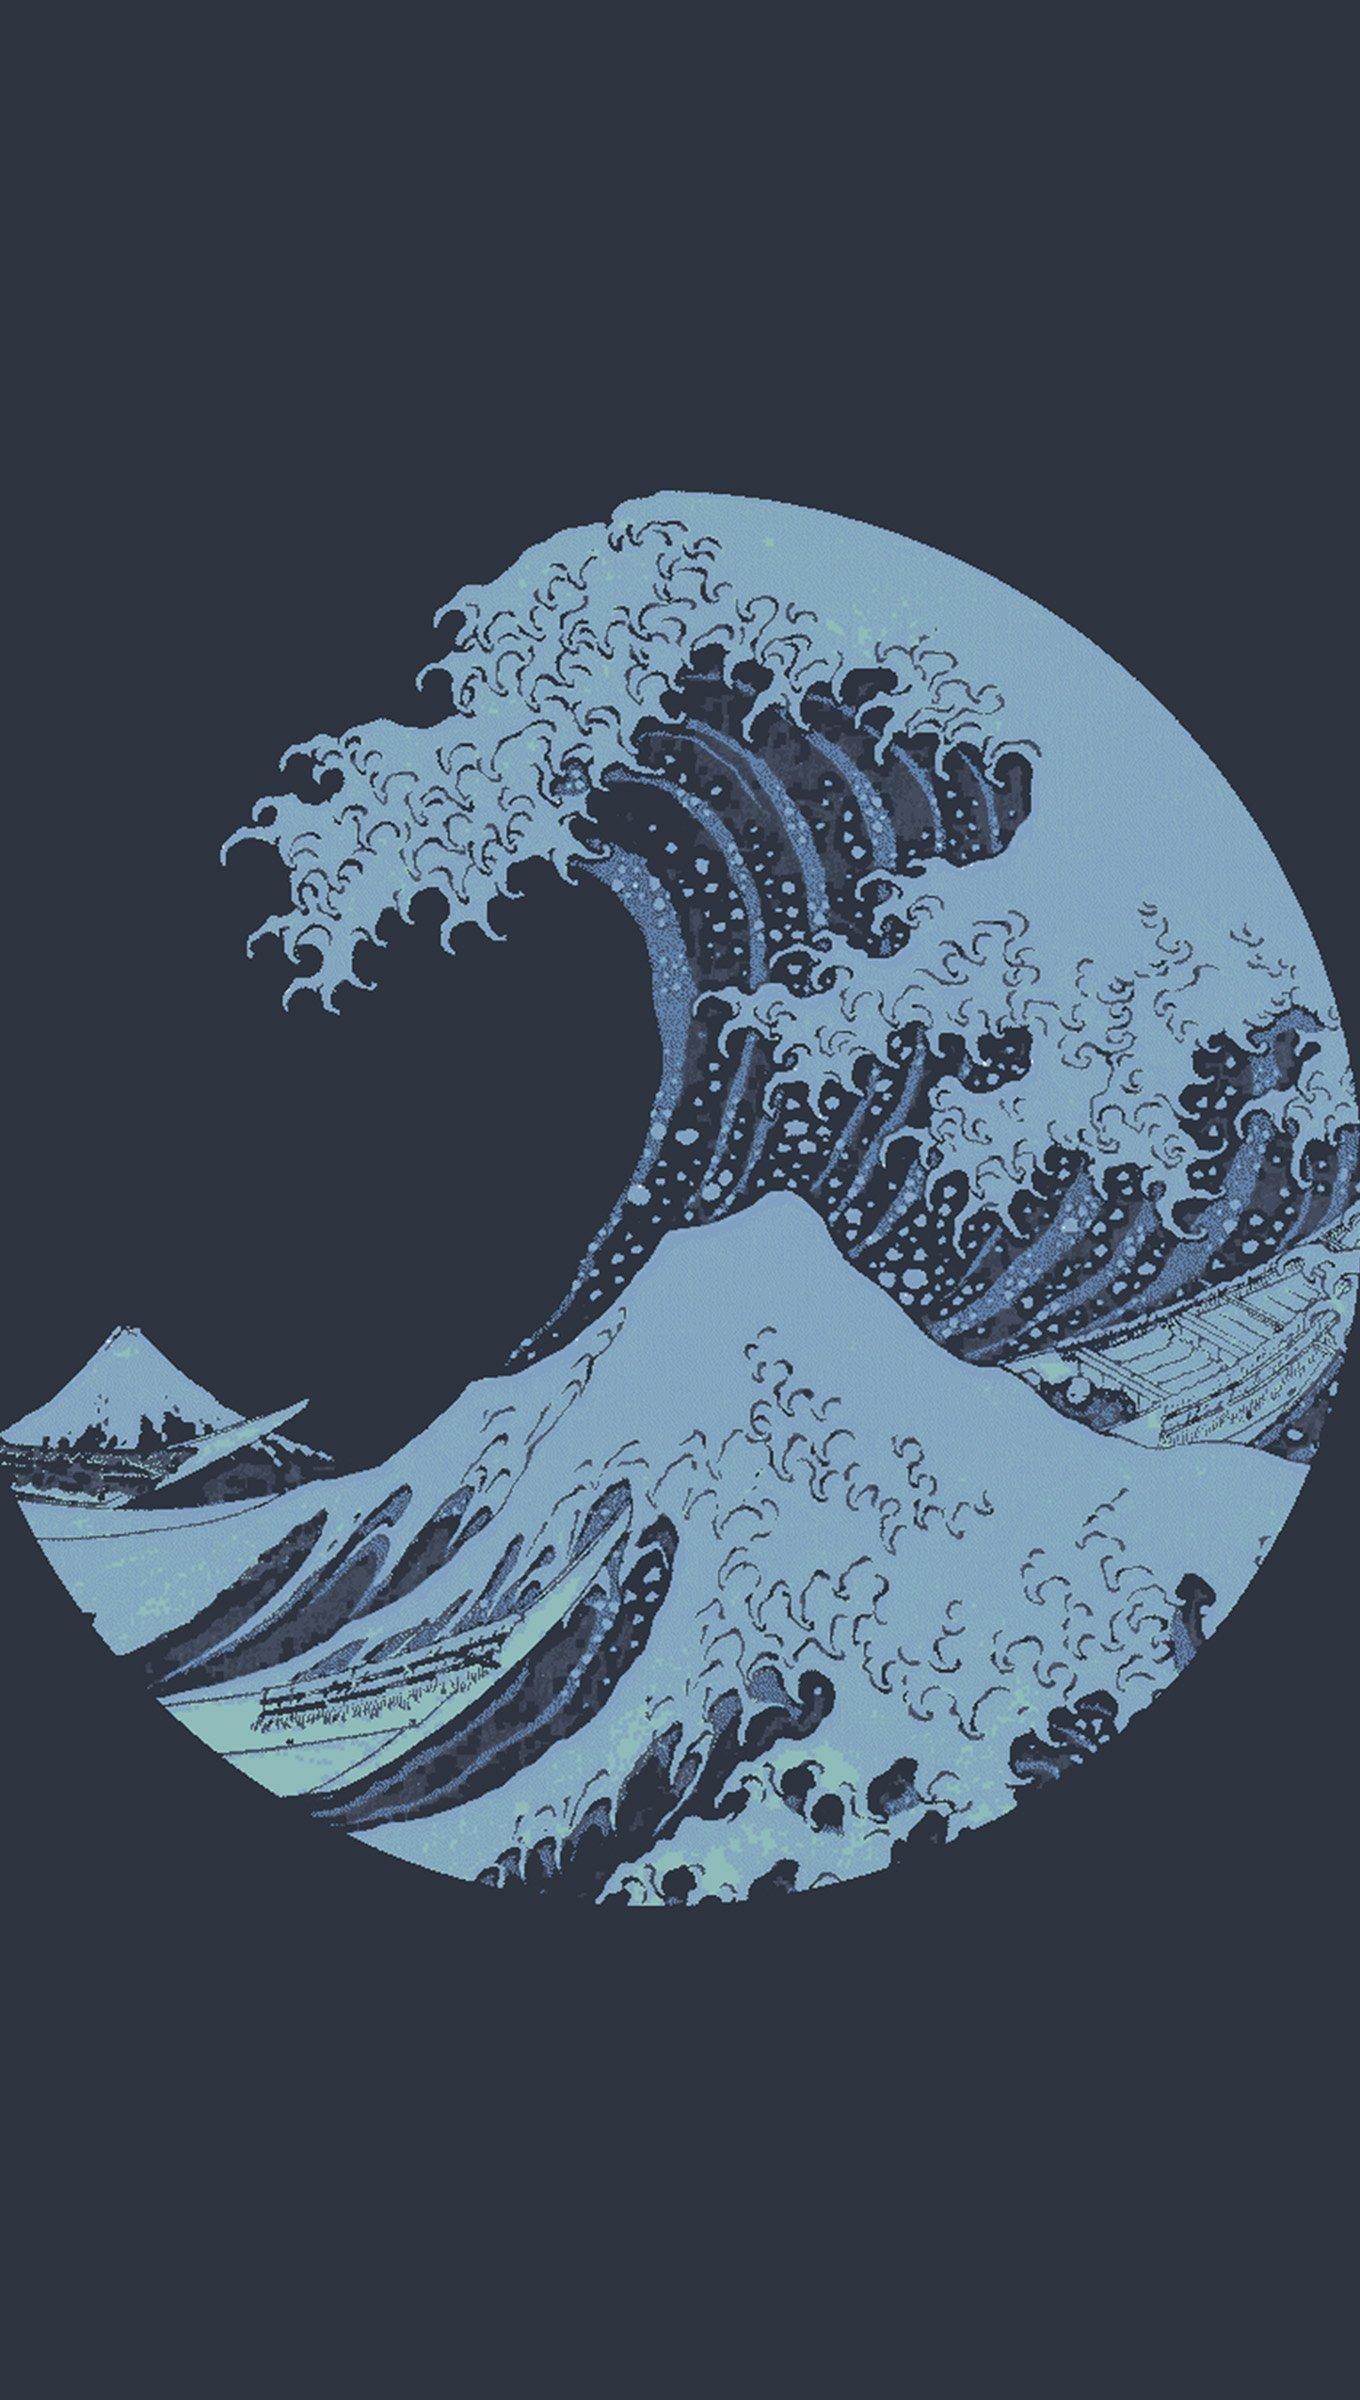 Wallpaper Minimalist waves logo Vertical